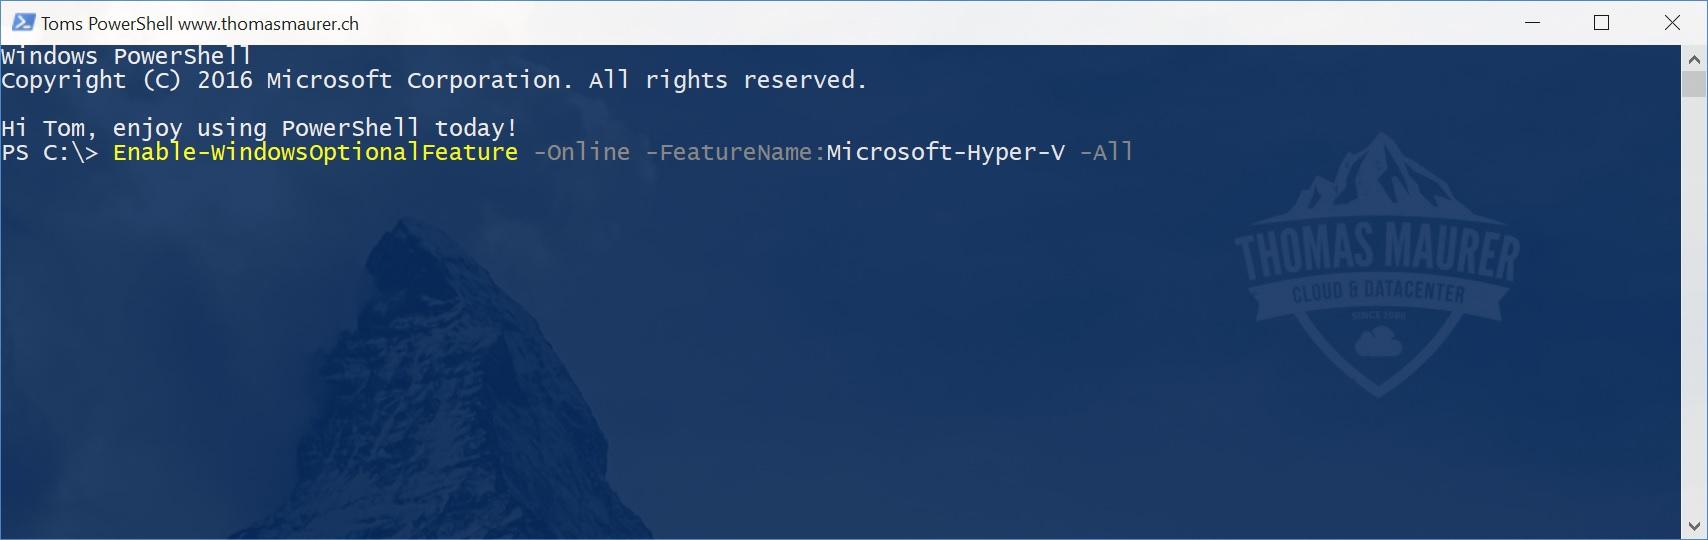 Install Hyper-V on Windows 10 using PowerShell - Thomas Maurer